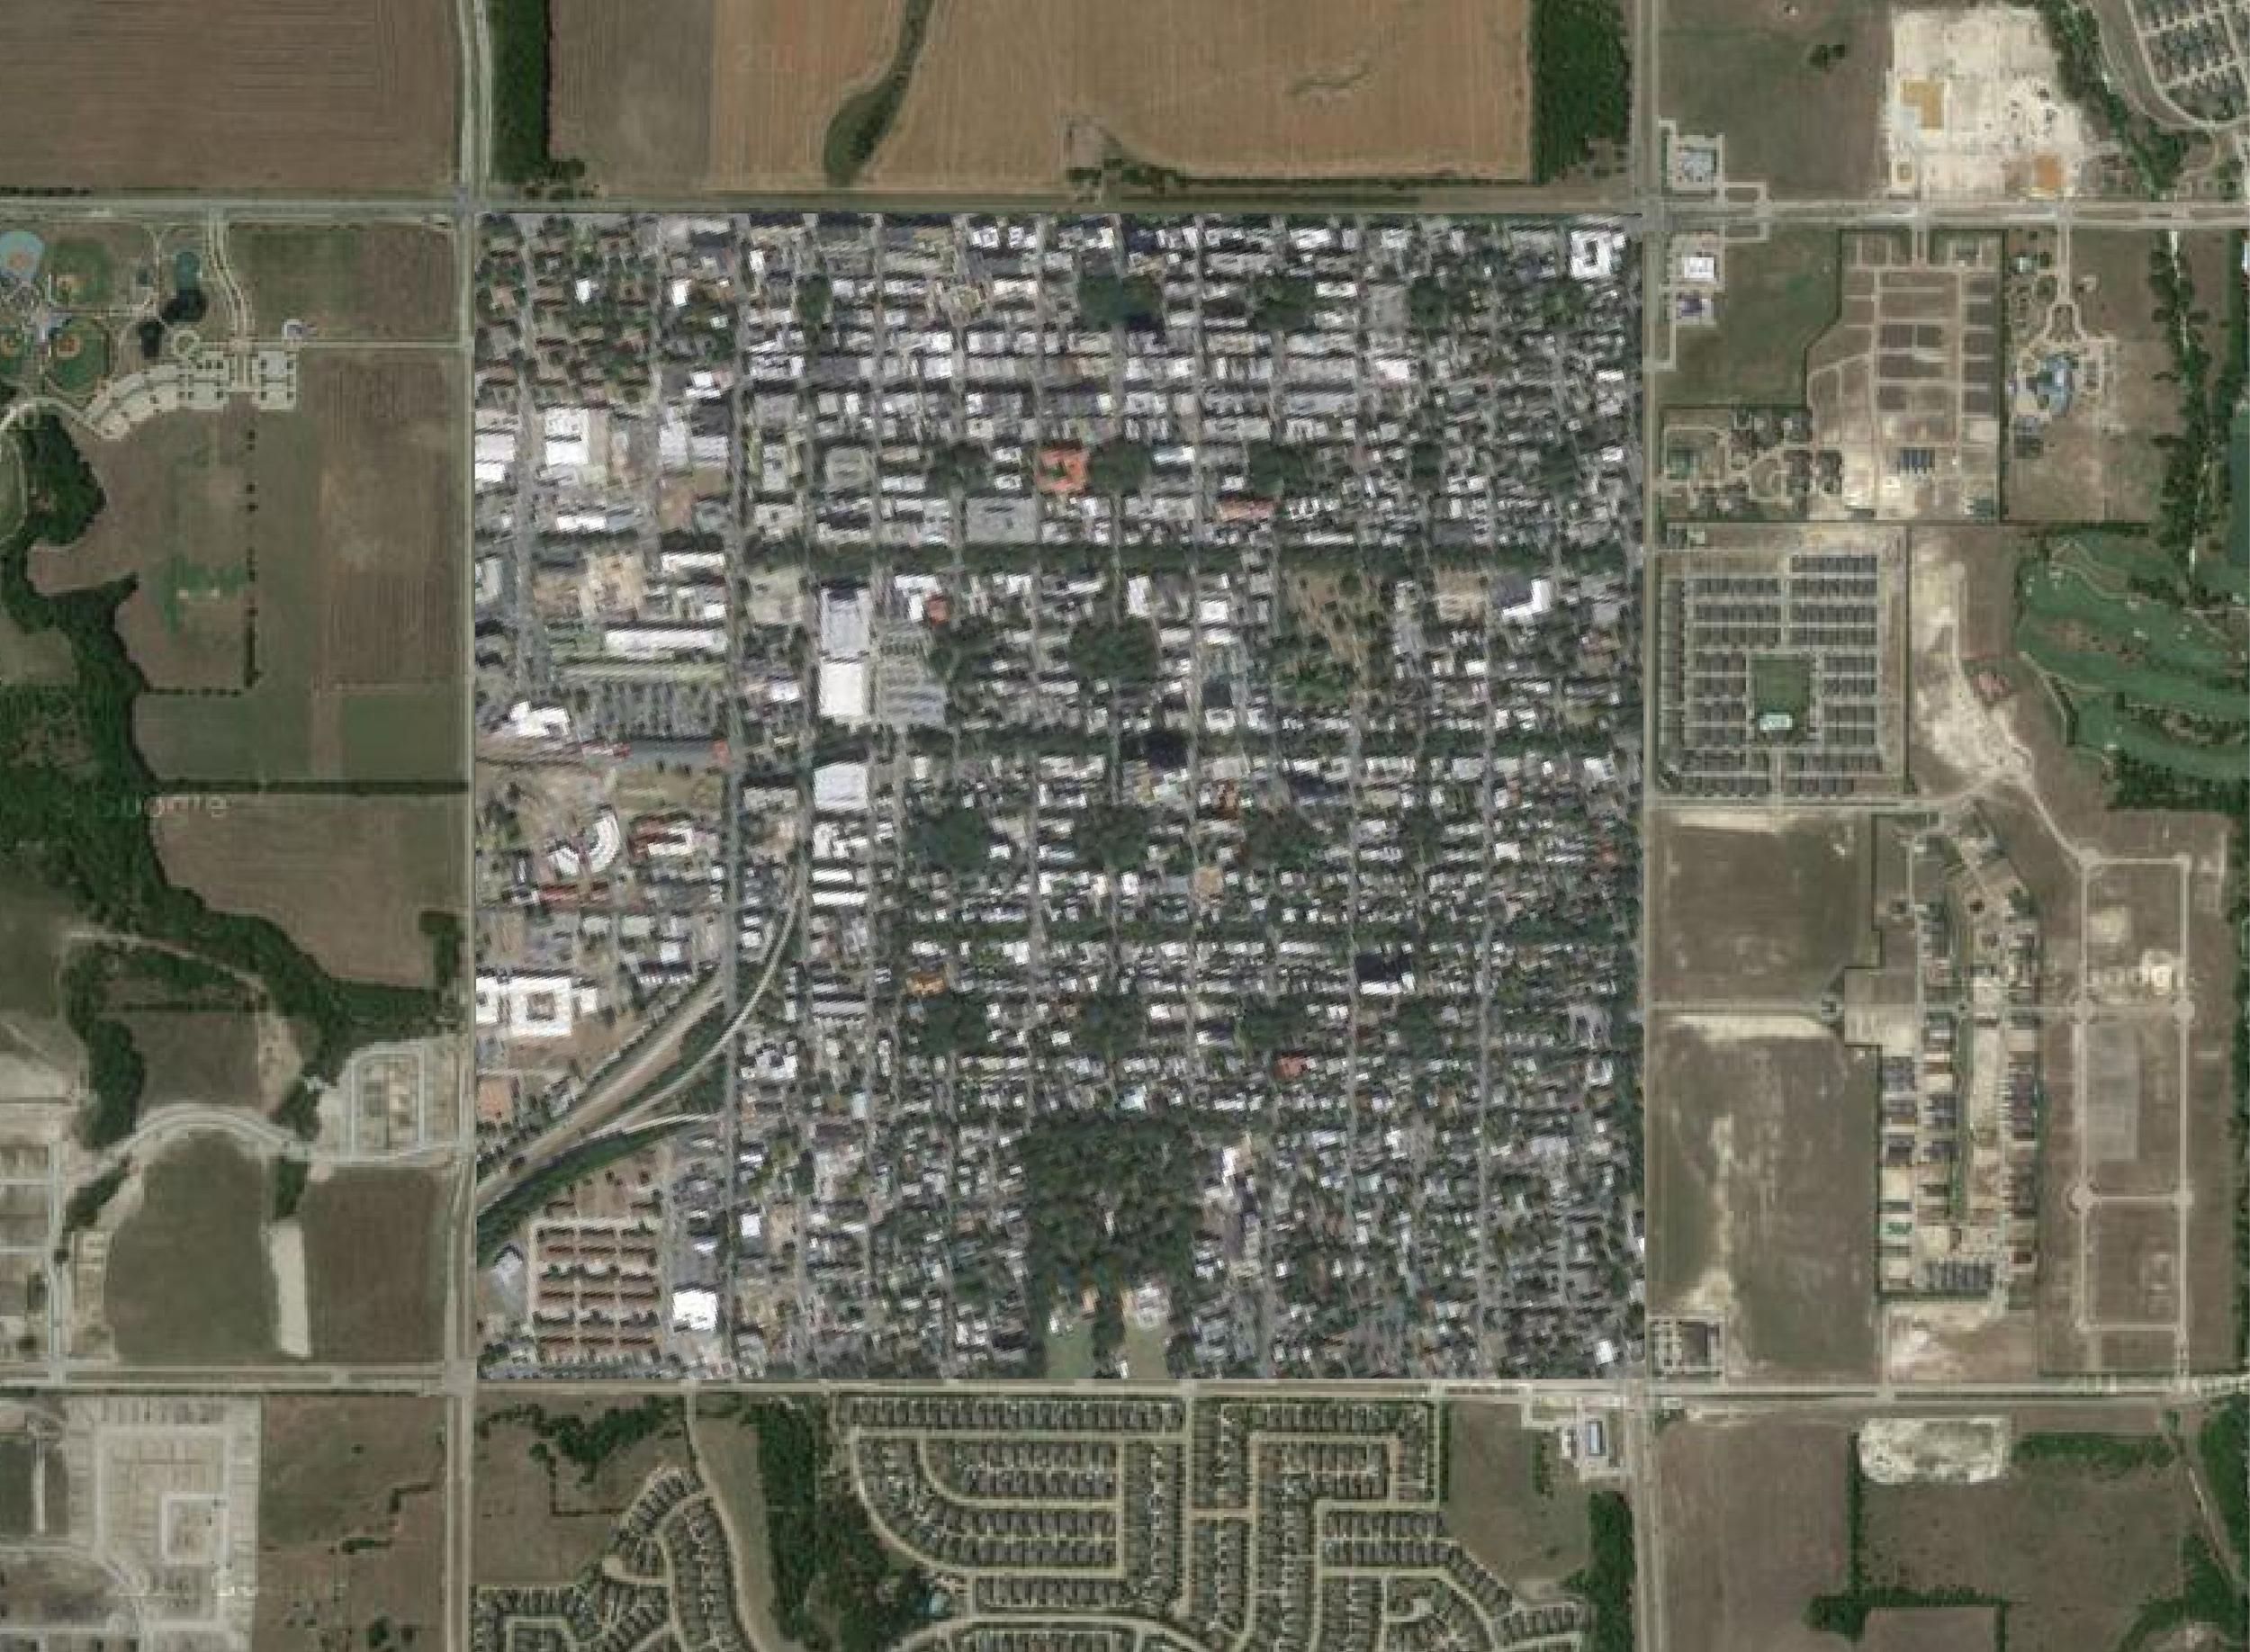 mile grid with savannah